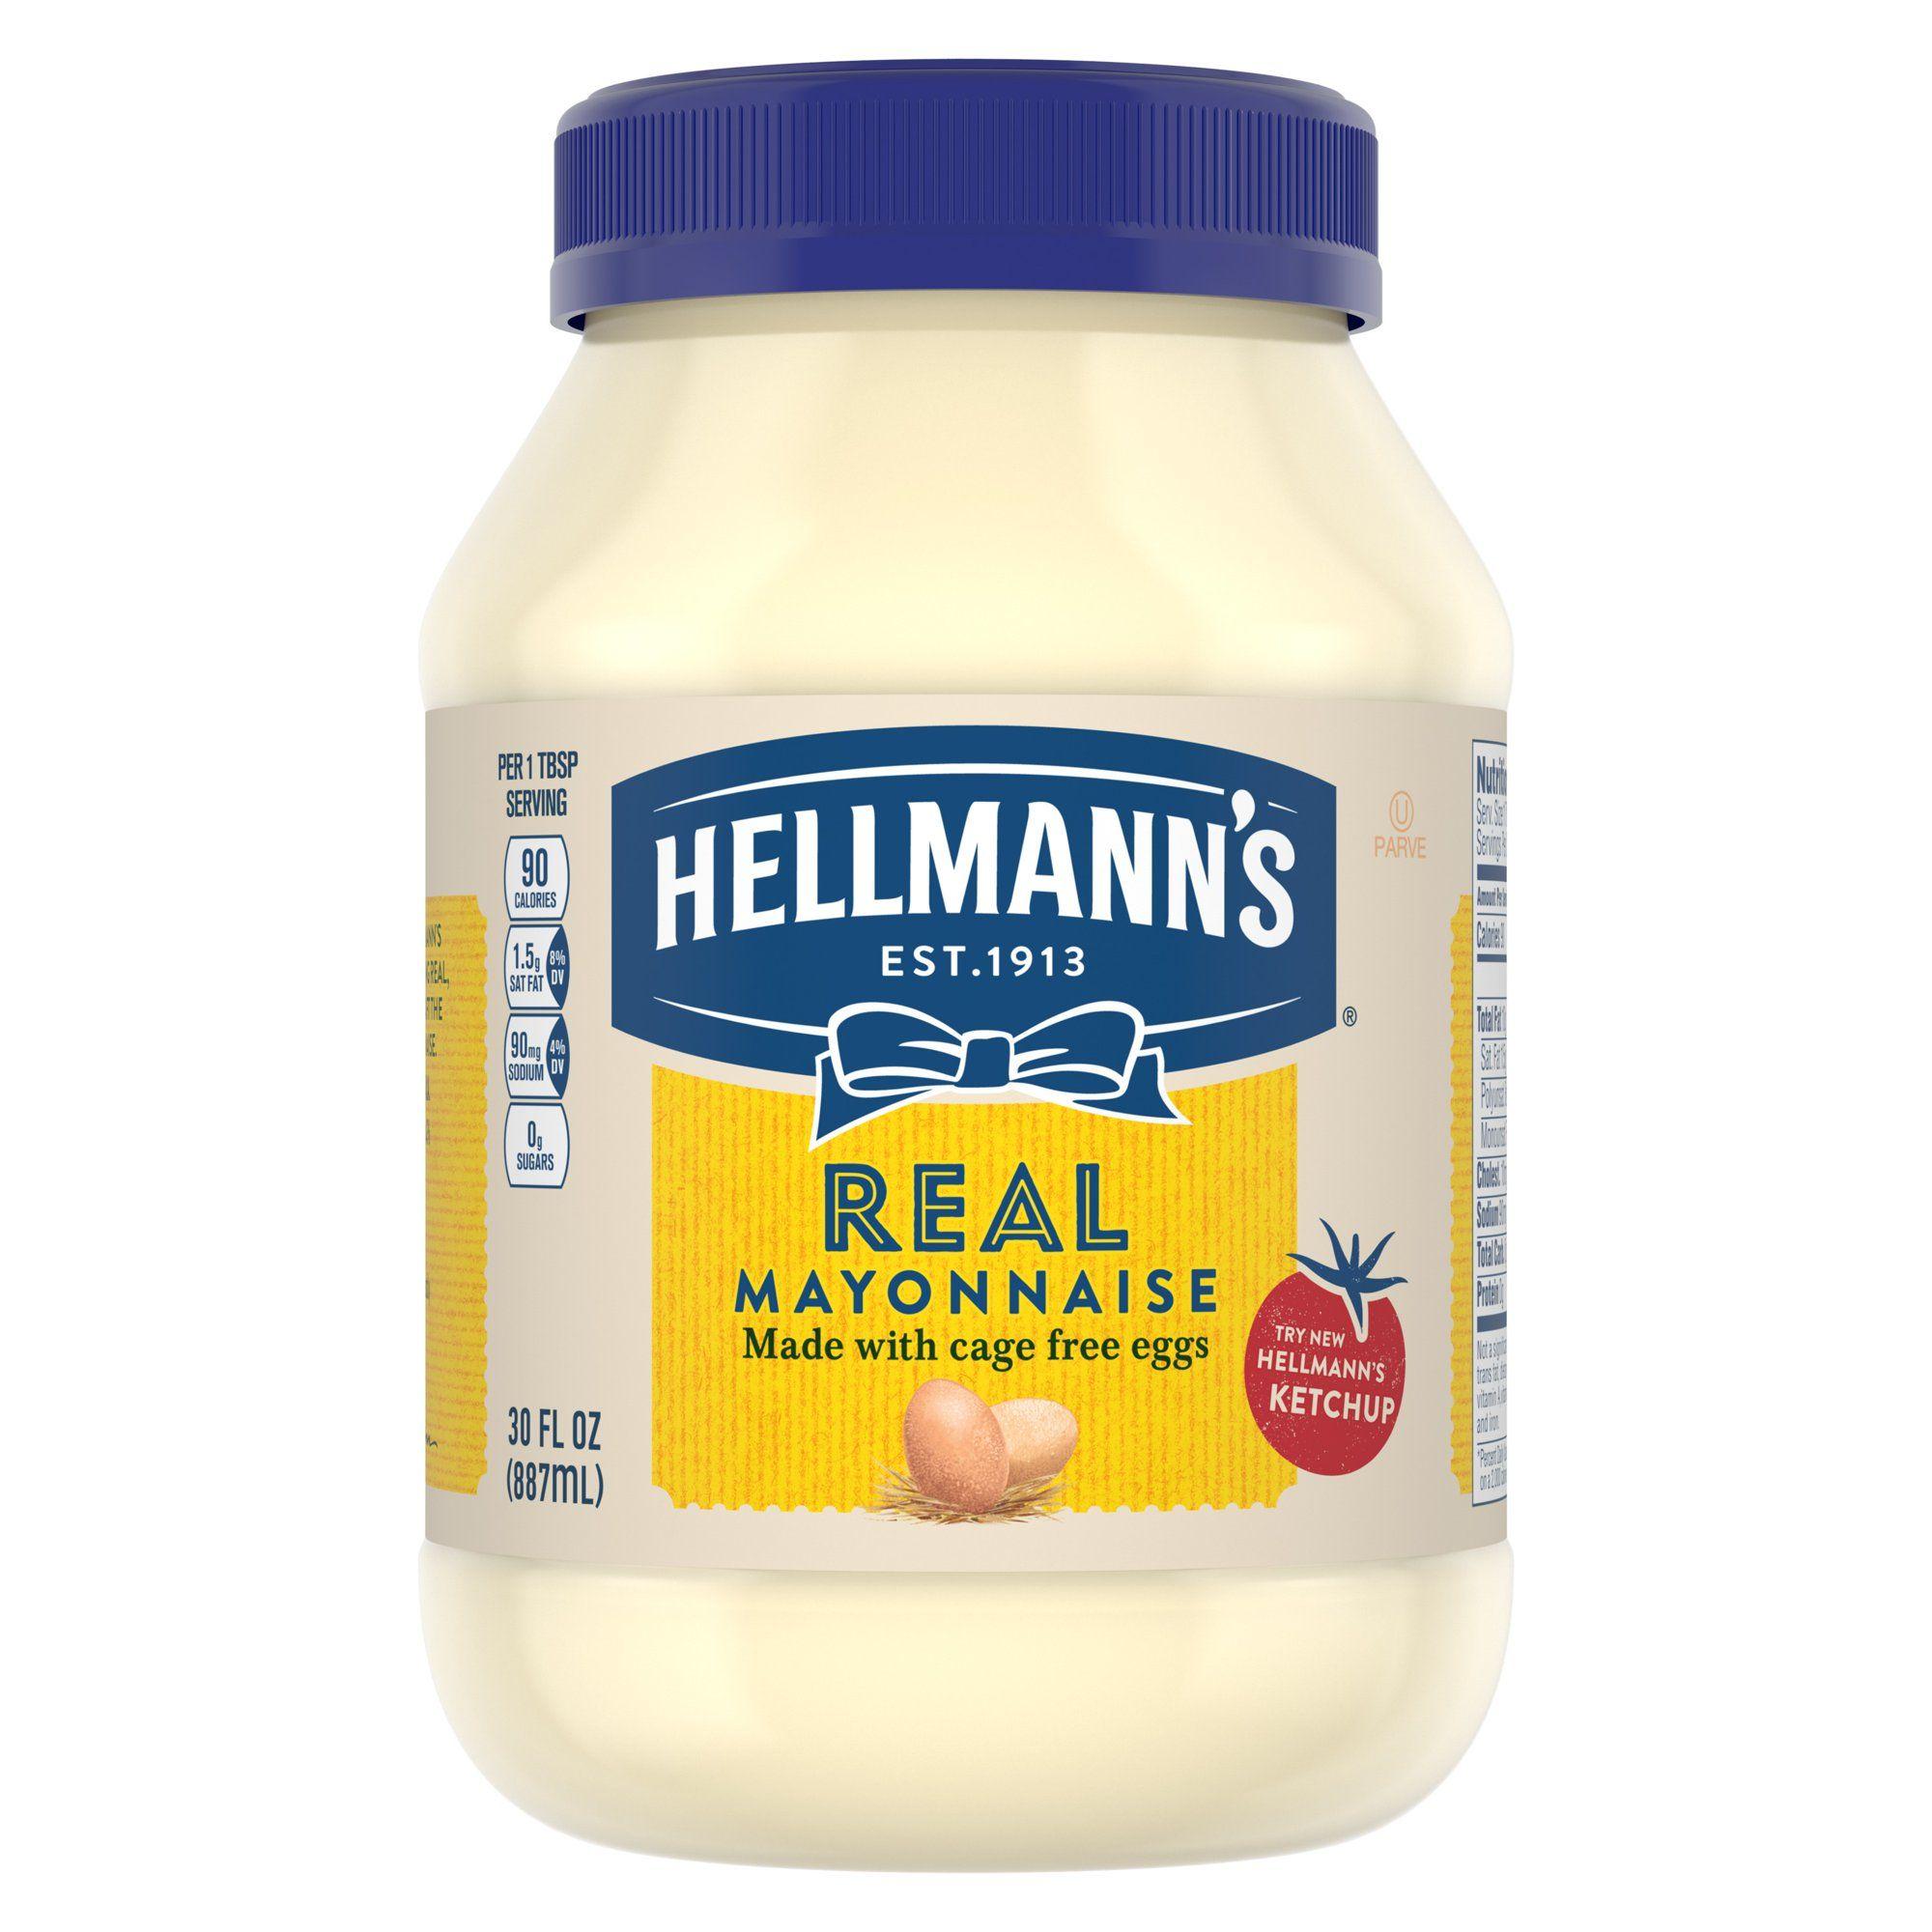 Hellmann's Mayonnaise Real Mayo 30 oz in